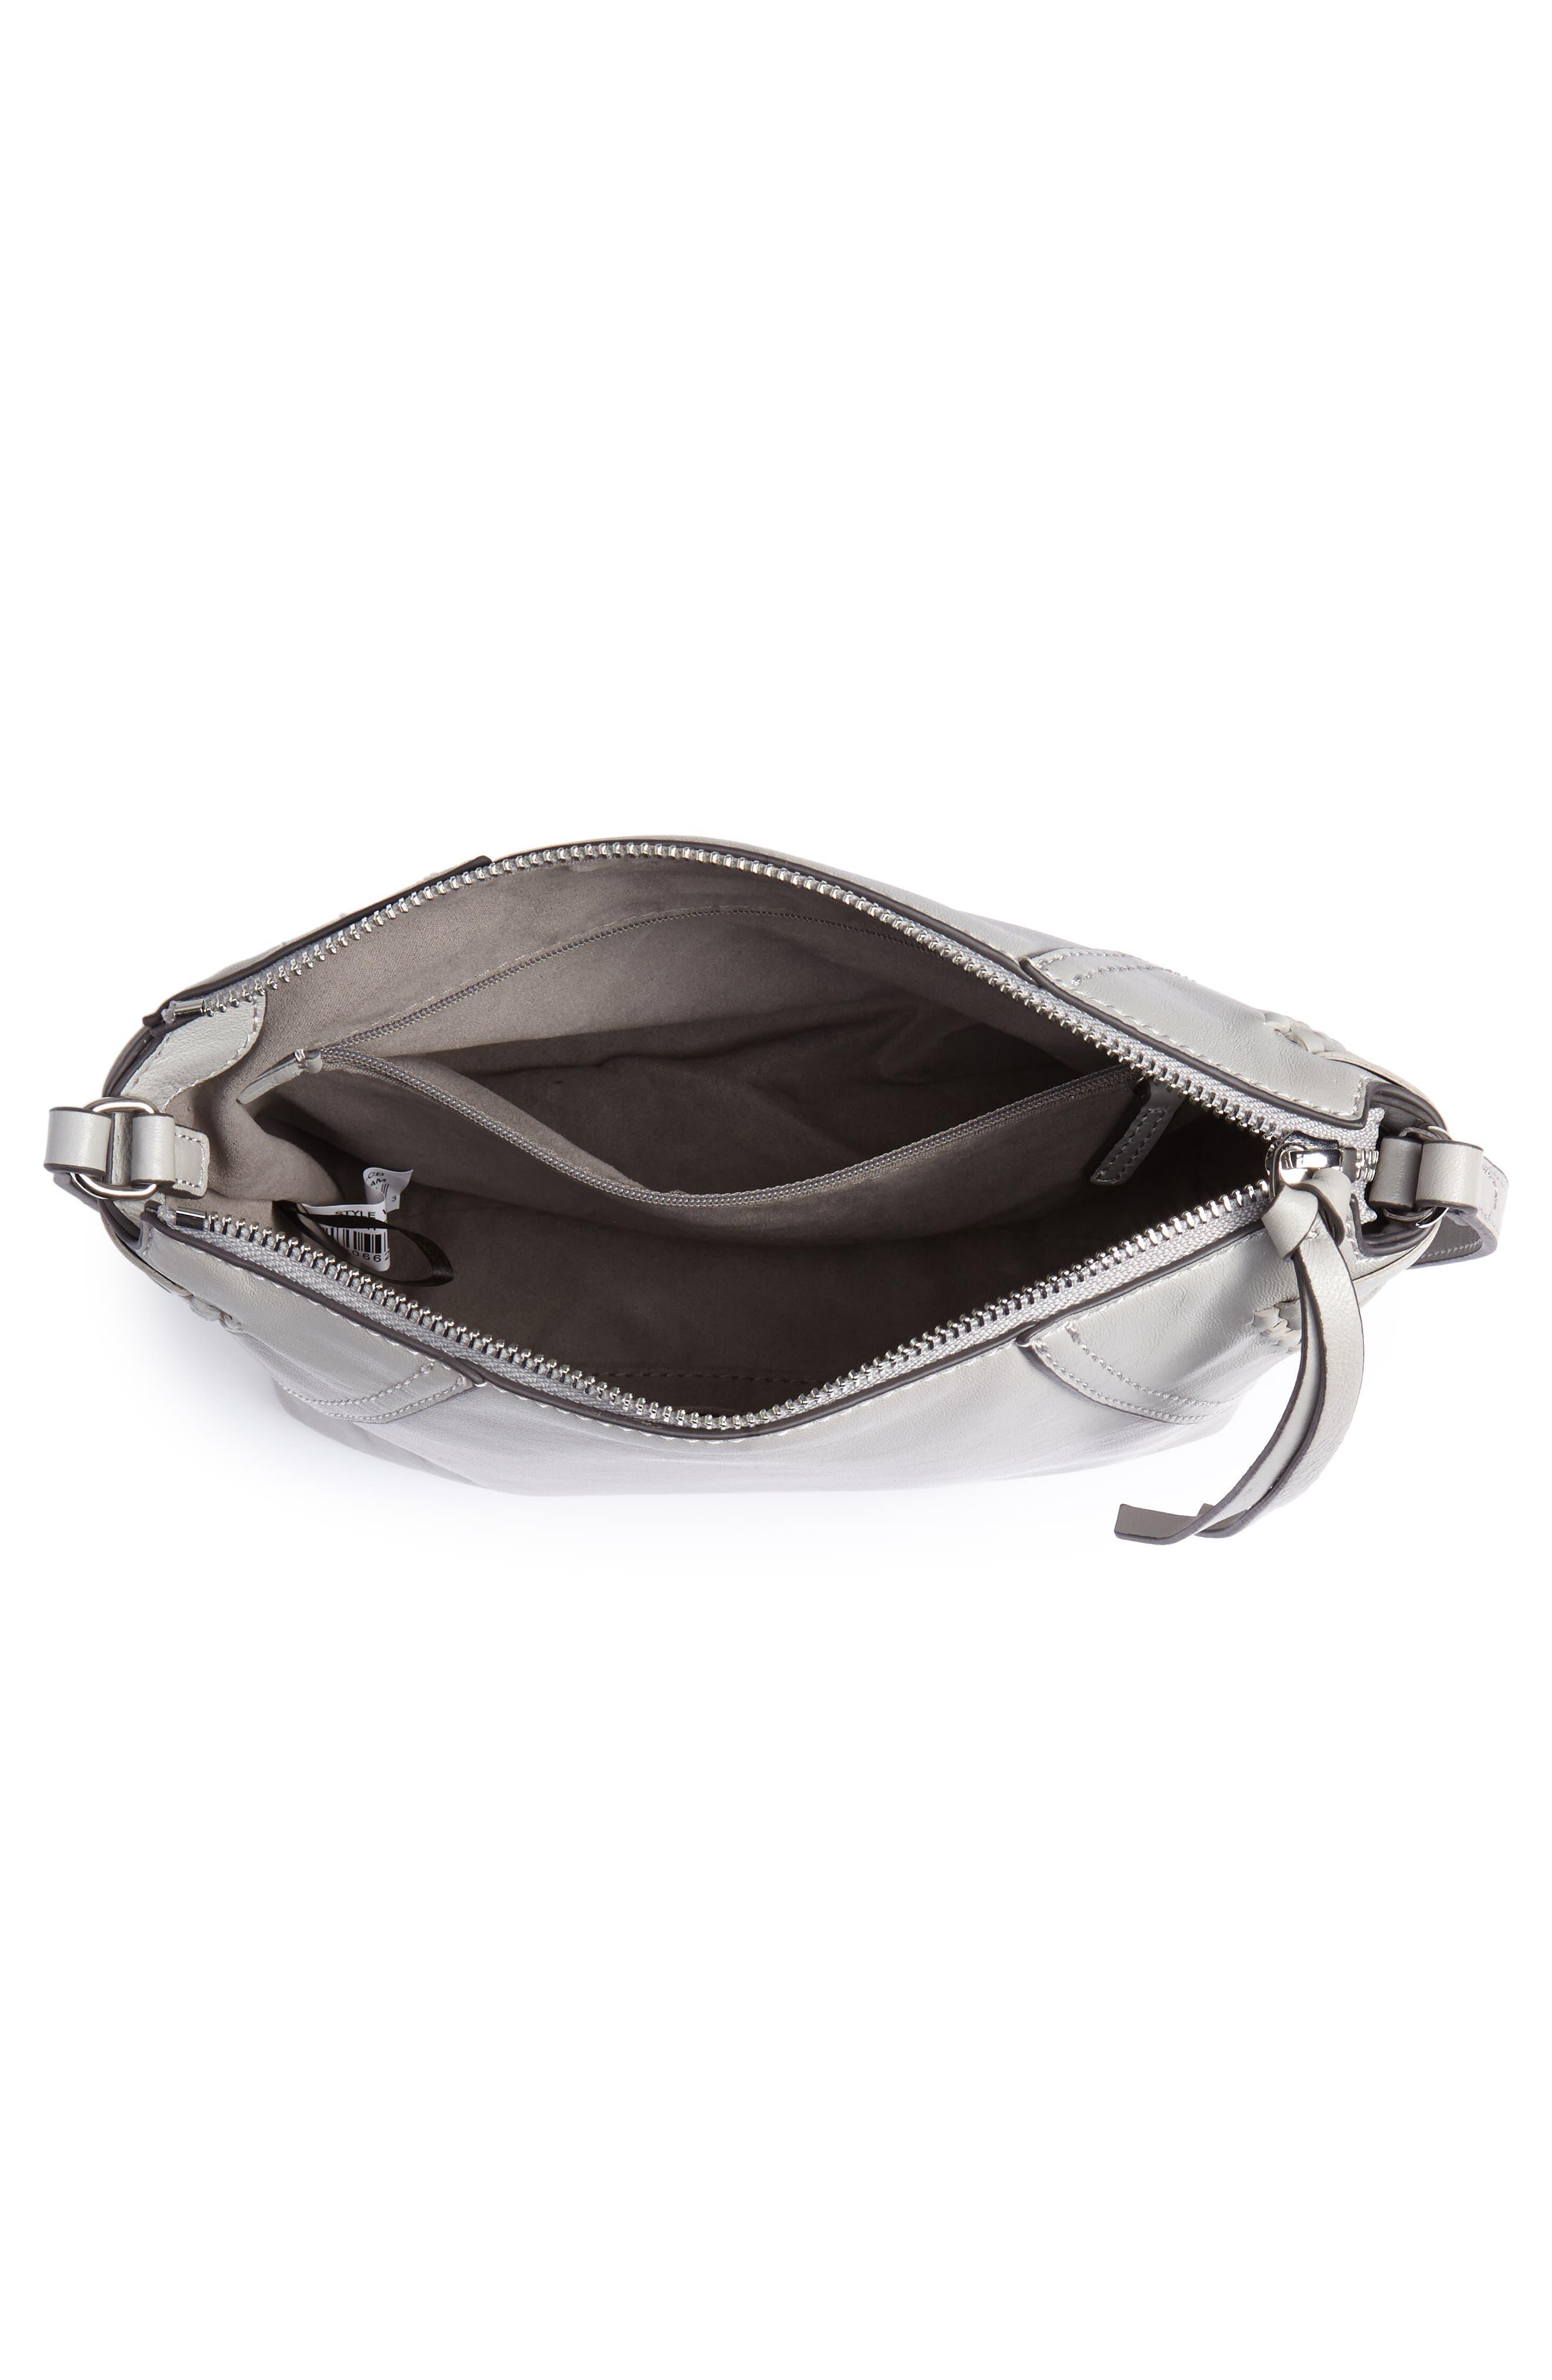 Ilda Leather Crossbody Bag,                             Alternate thumbnail 4, color,                             Full Steam